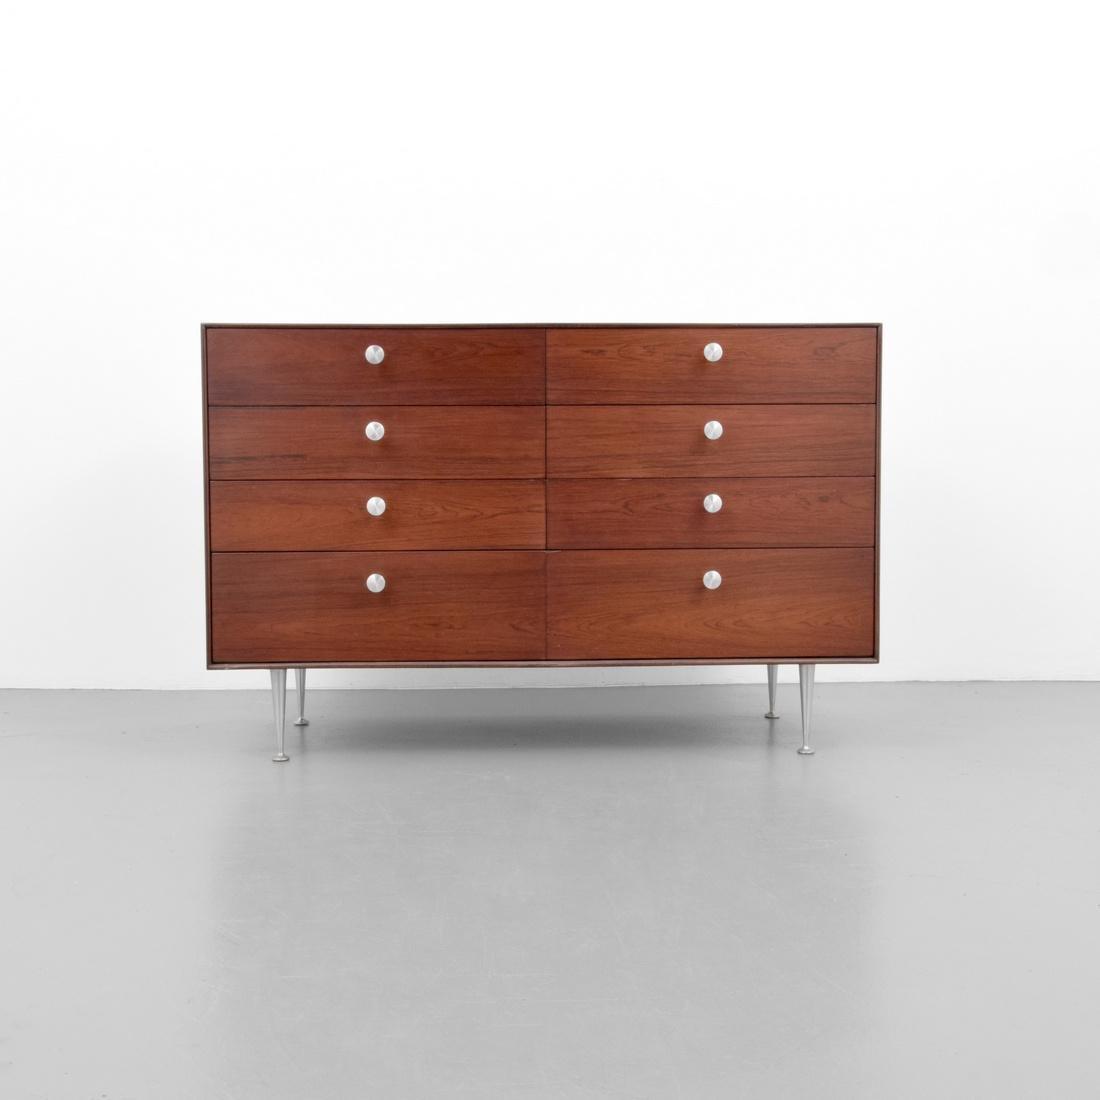 George Nelson THIN EDGE Cabinet / Dresser